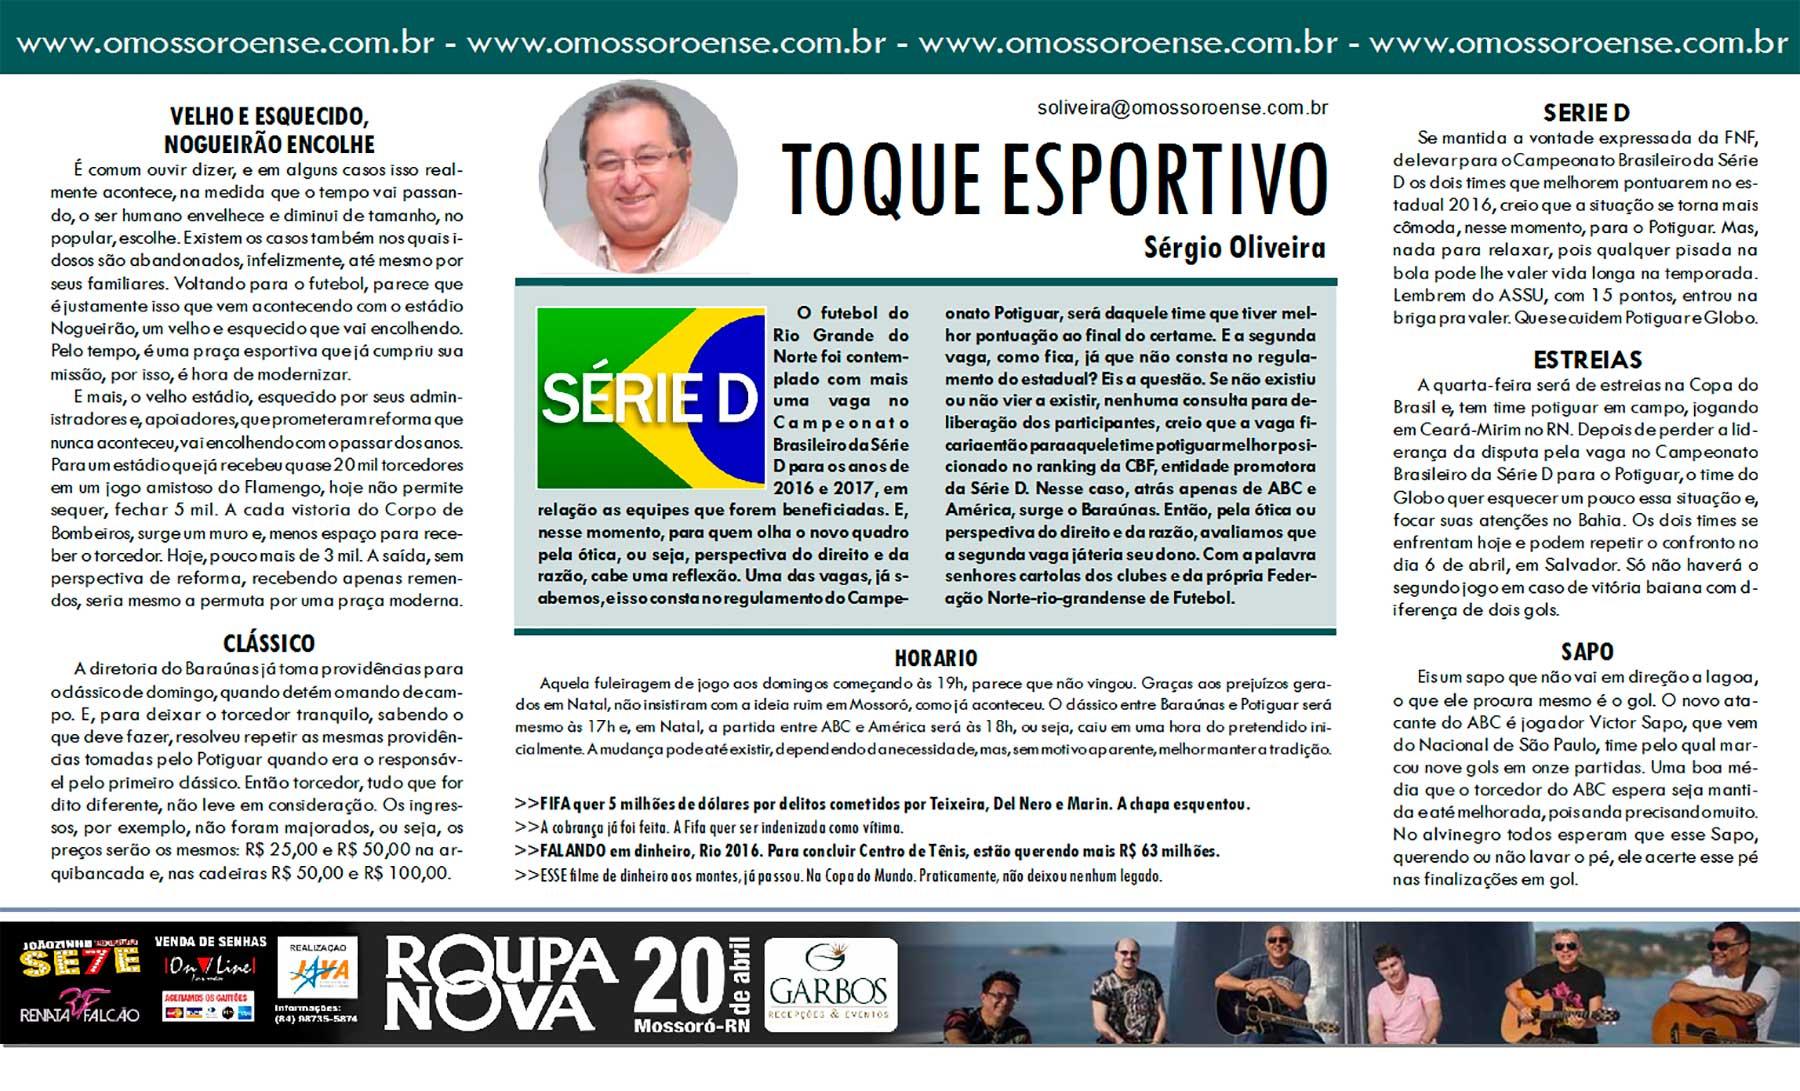 SERGIO-OLIVEIRA---16-03-16